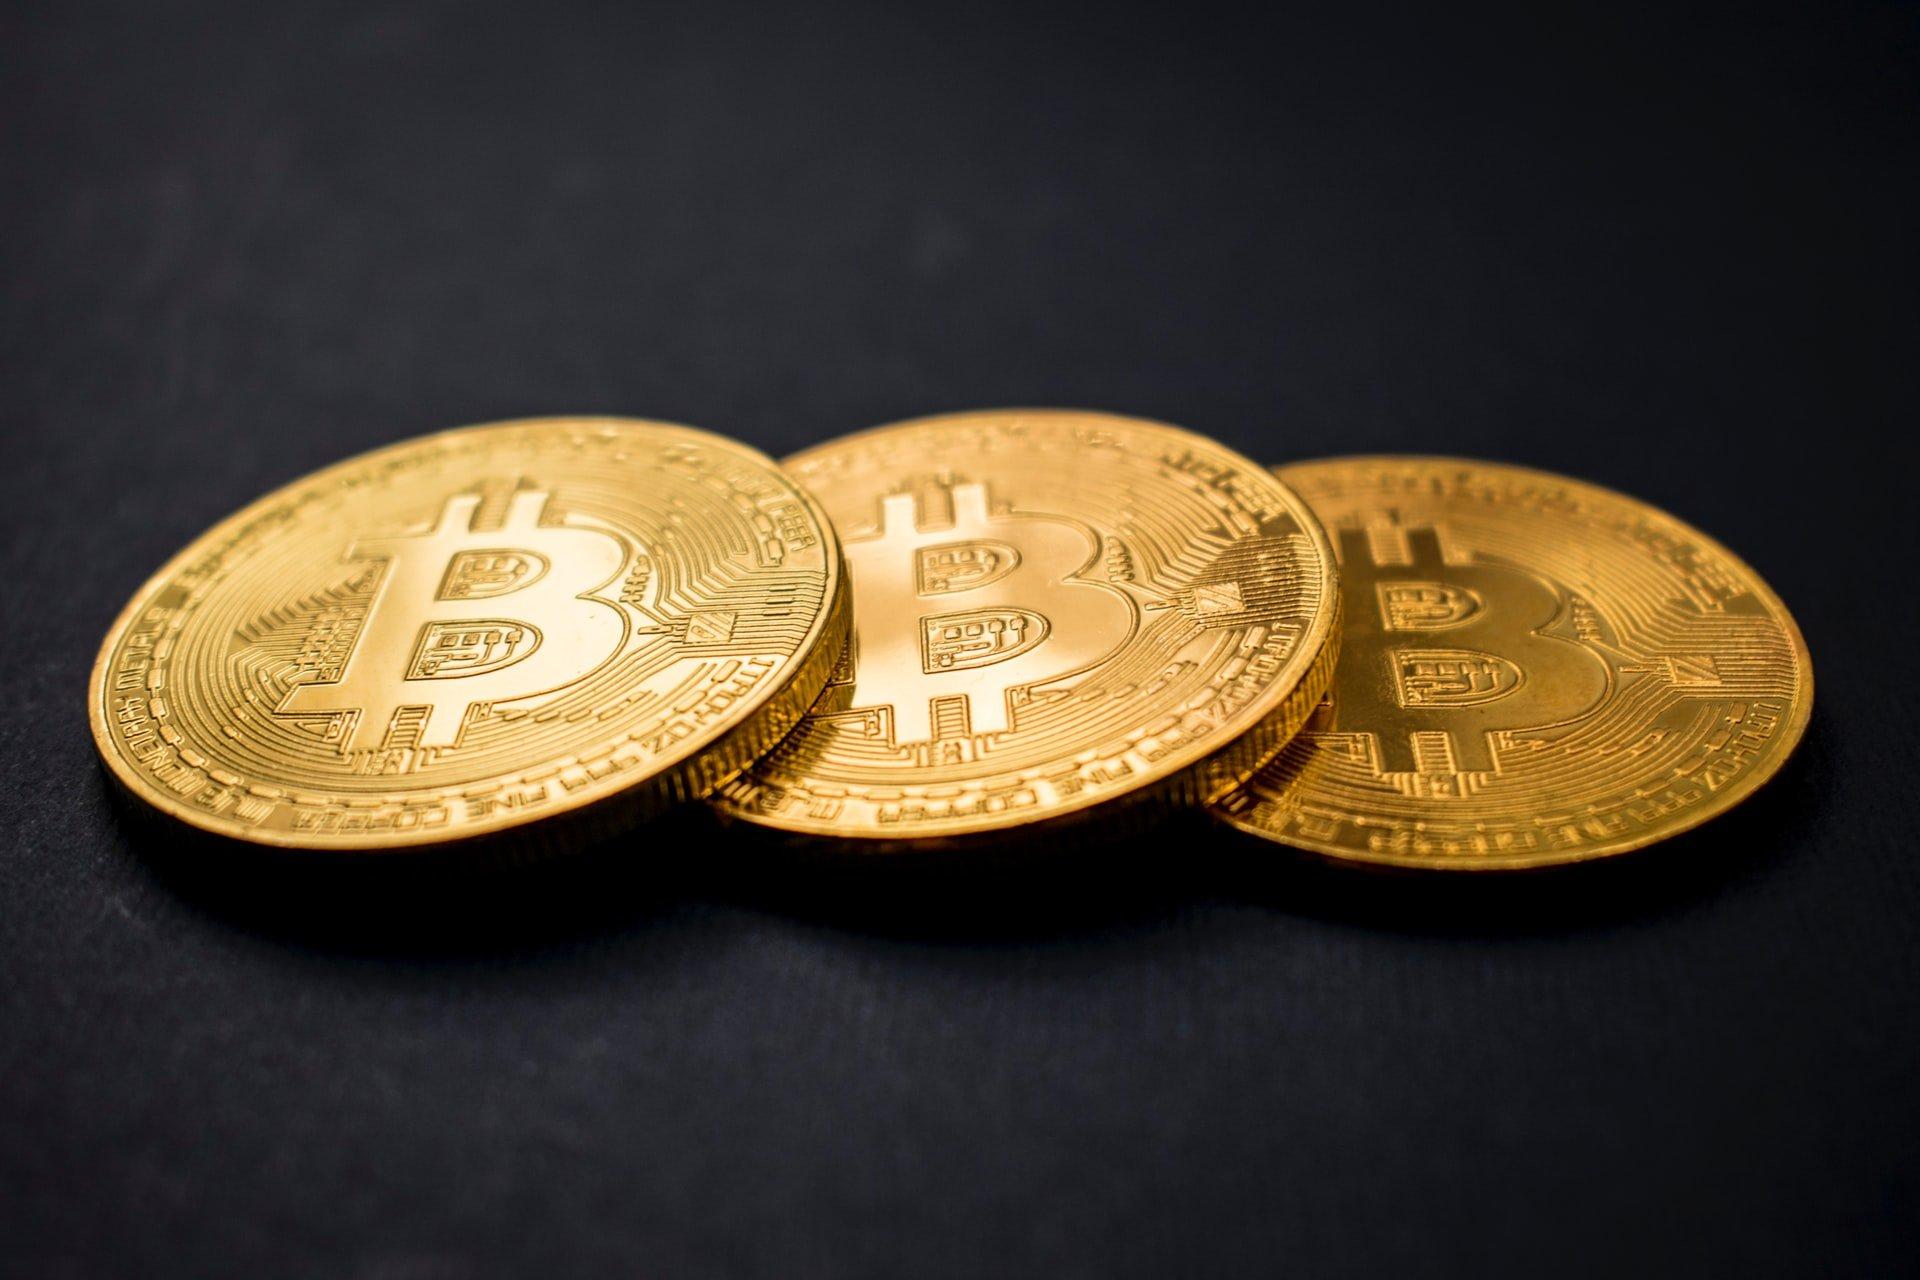 Bitcoin speculative vehicle